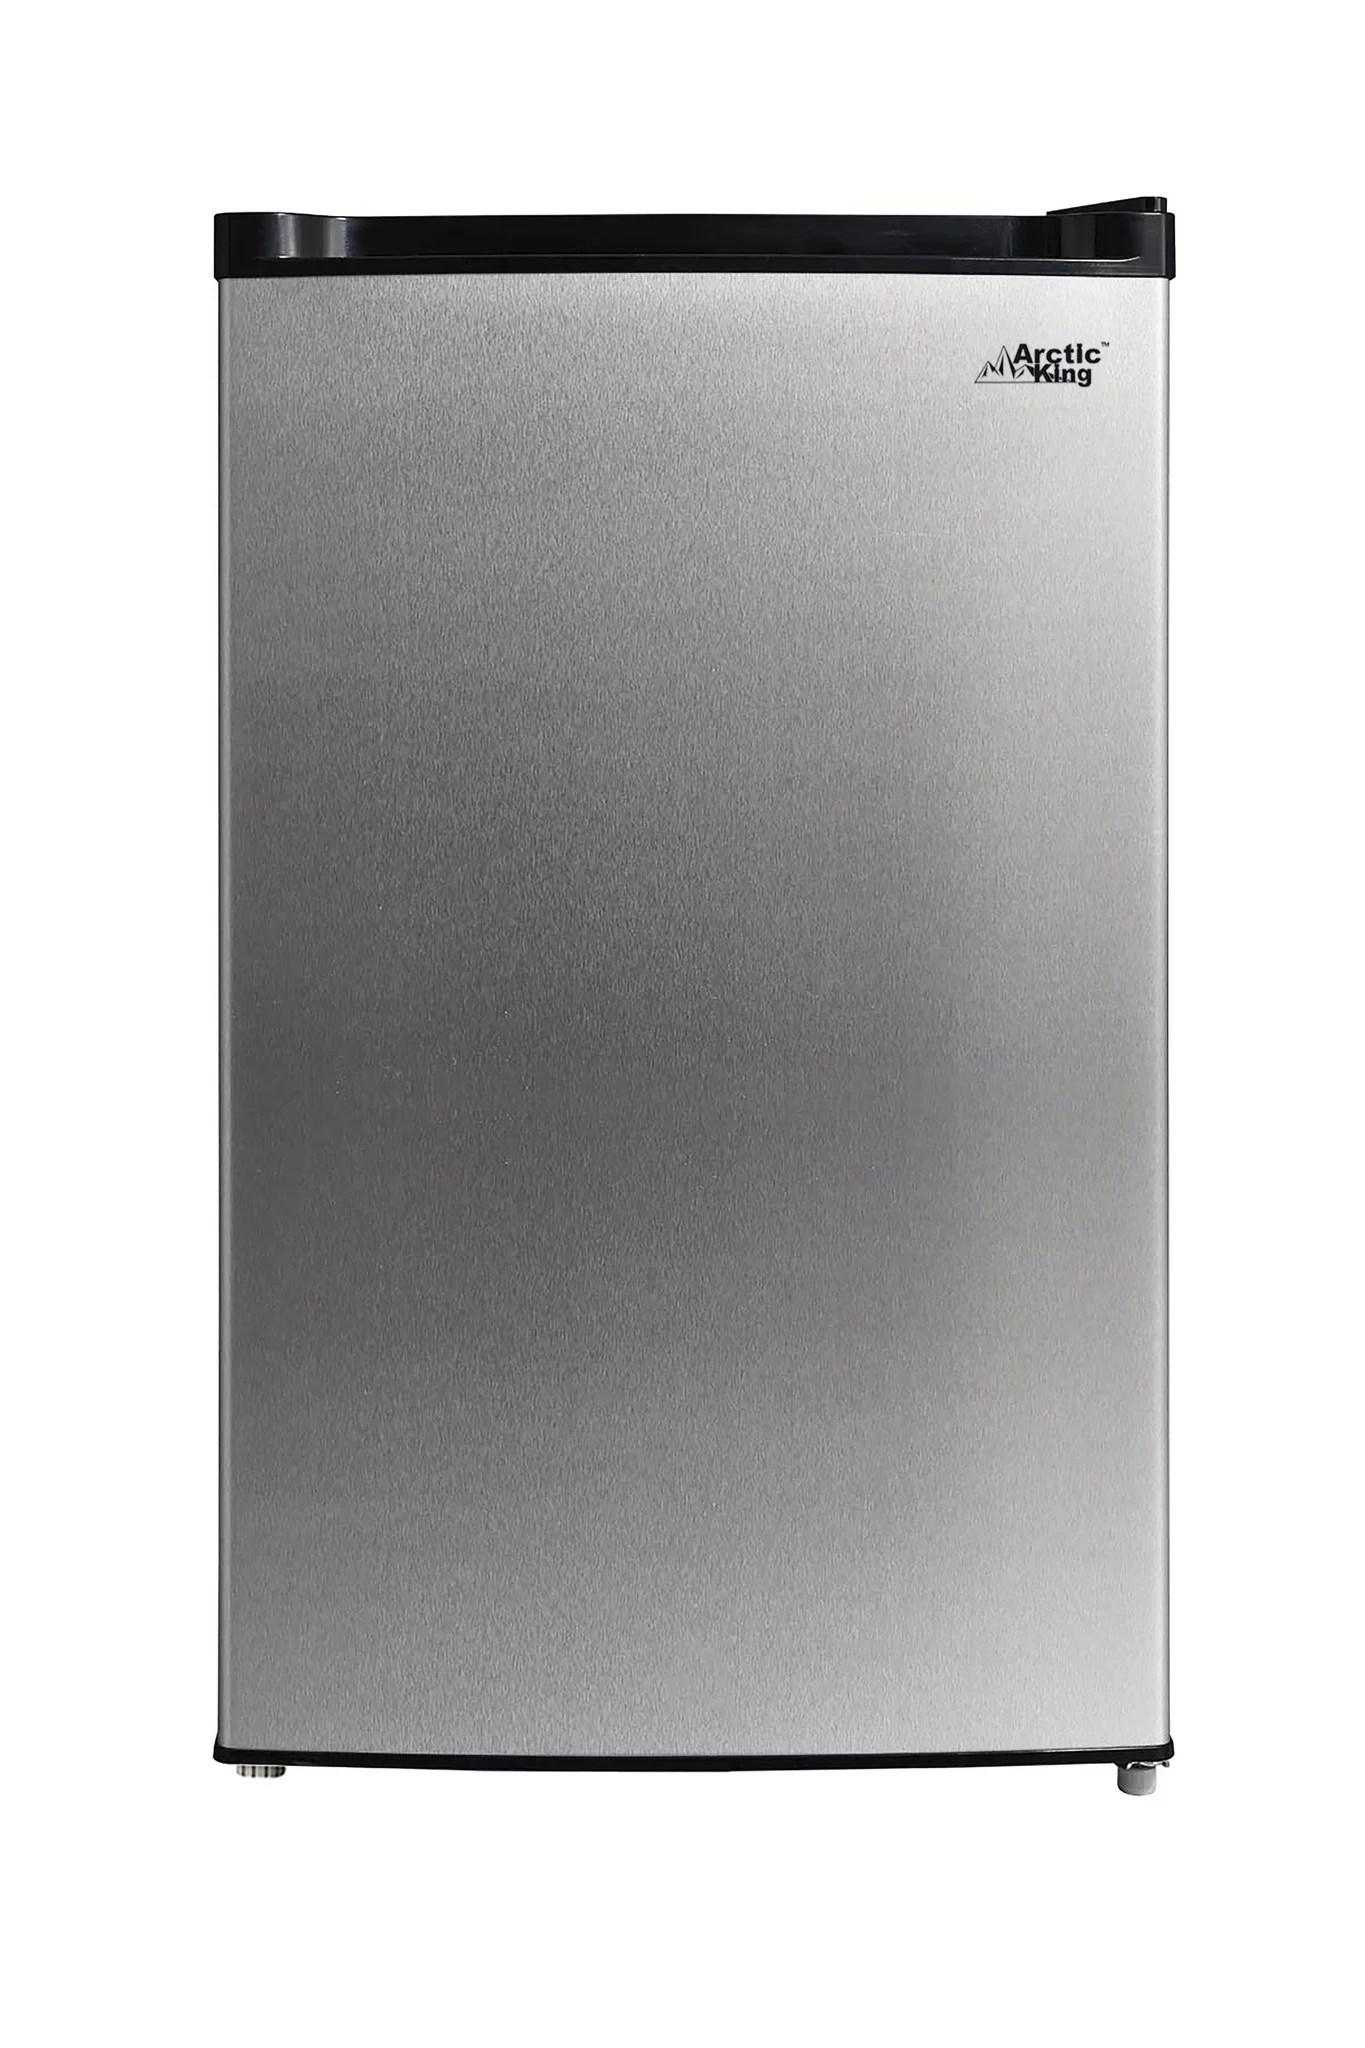 Arctic King 3.0 cu ft Upright Freezer Stainless Steel Door, E-star